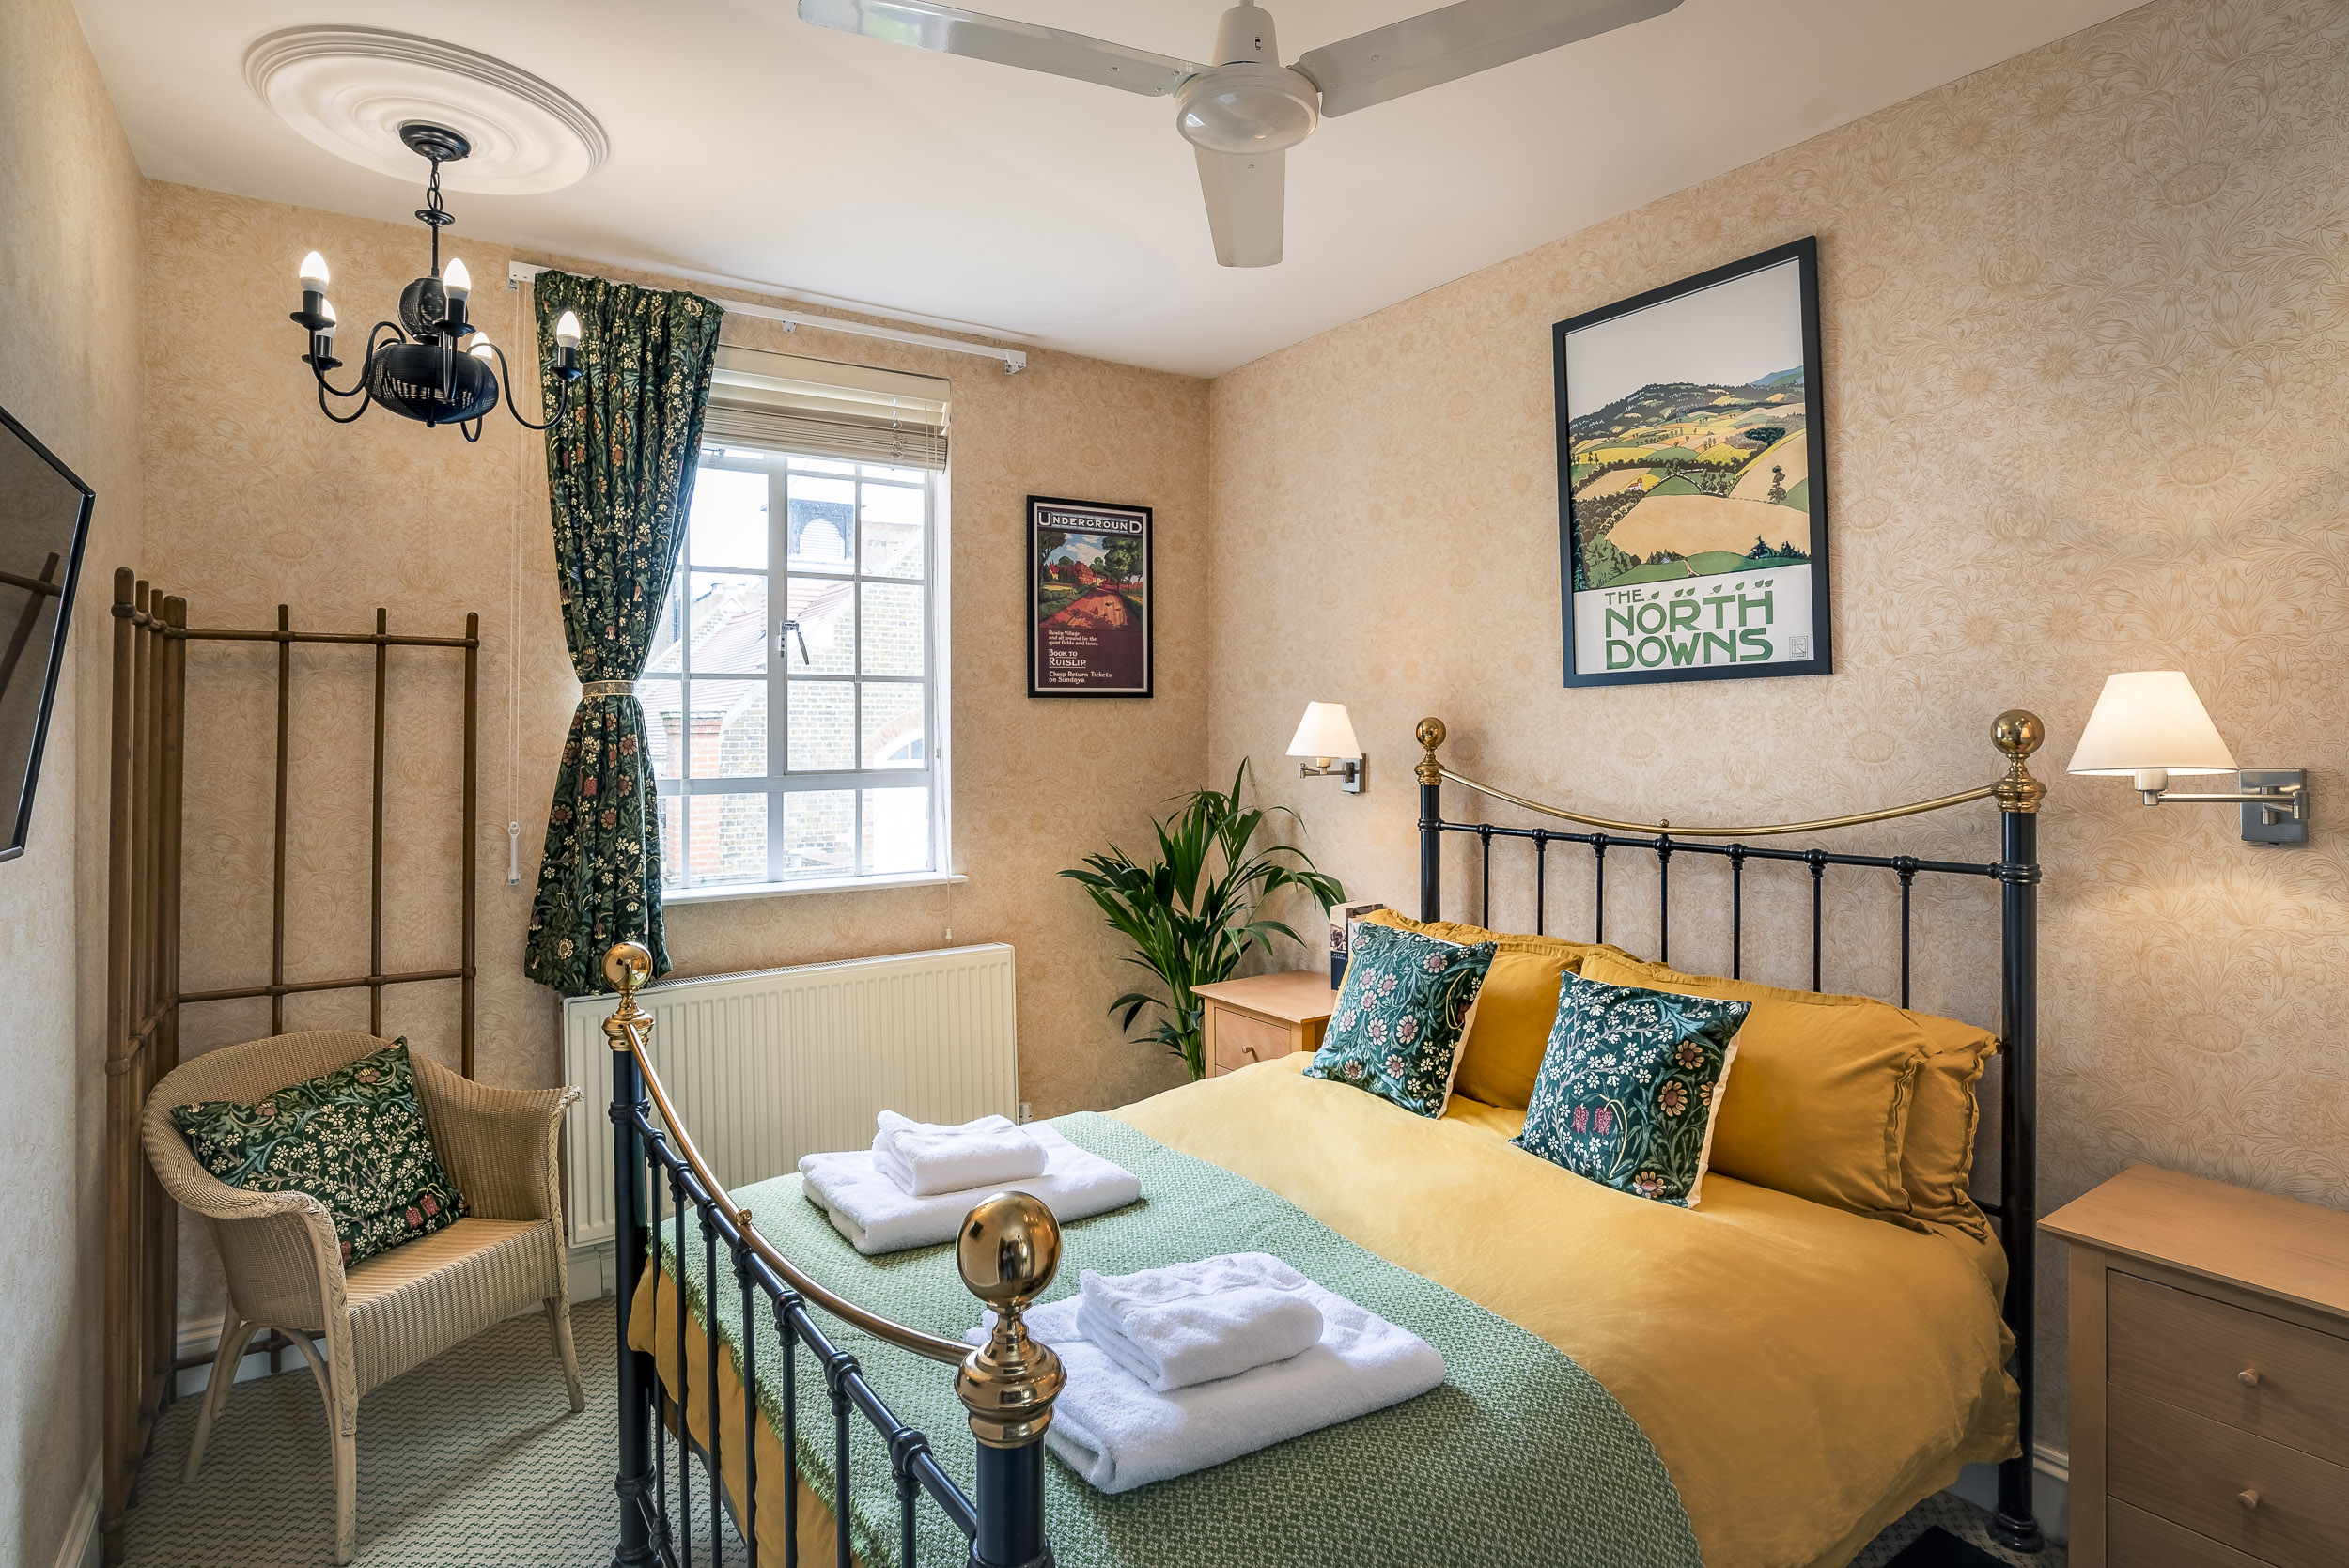 interior-photographer-london-AirBnB-Portobello-Rd